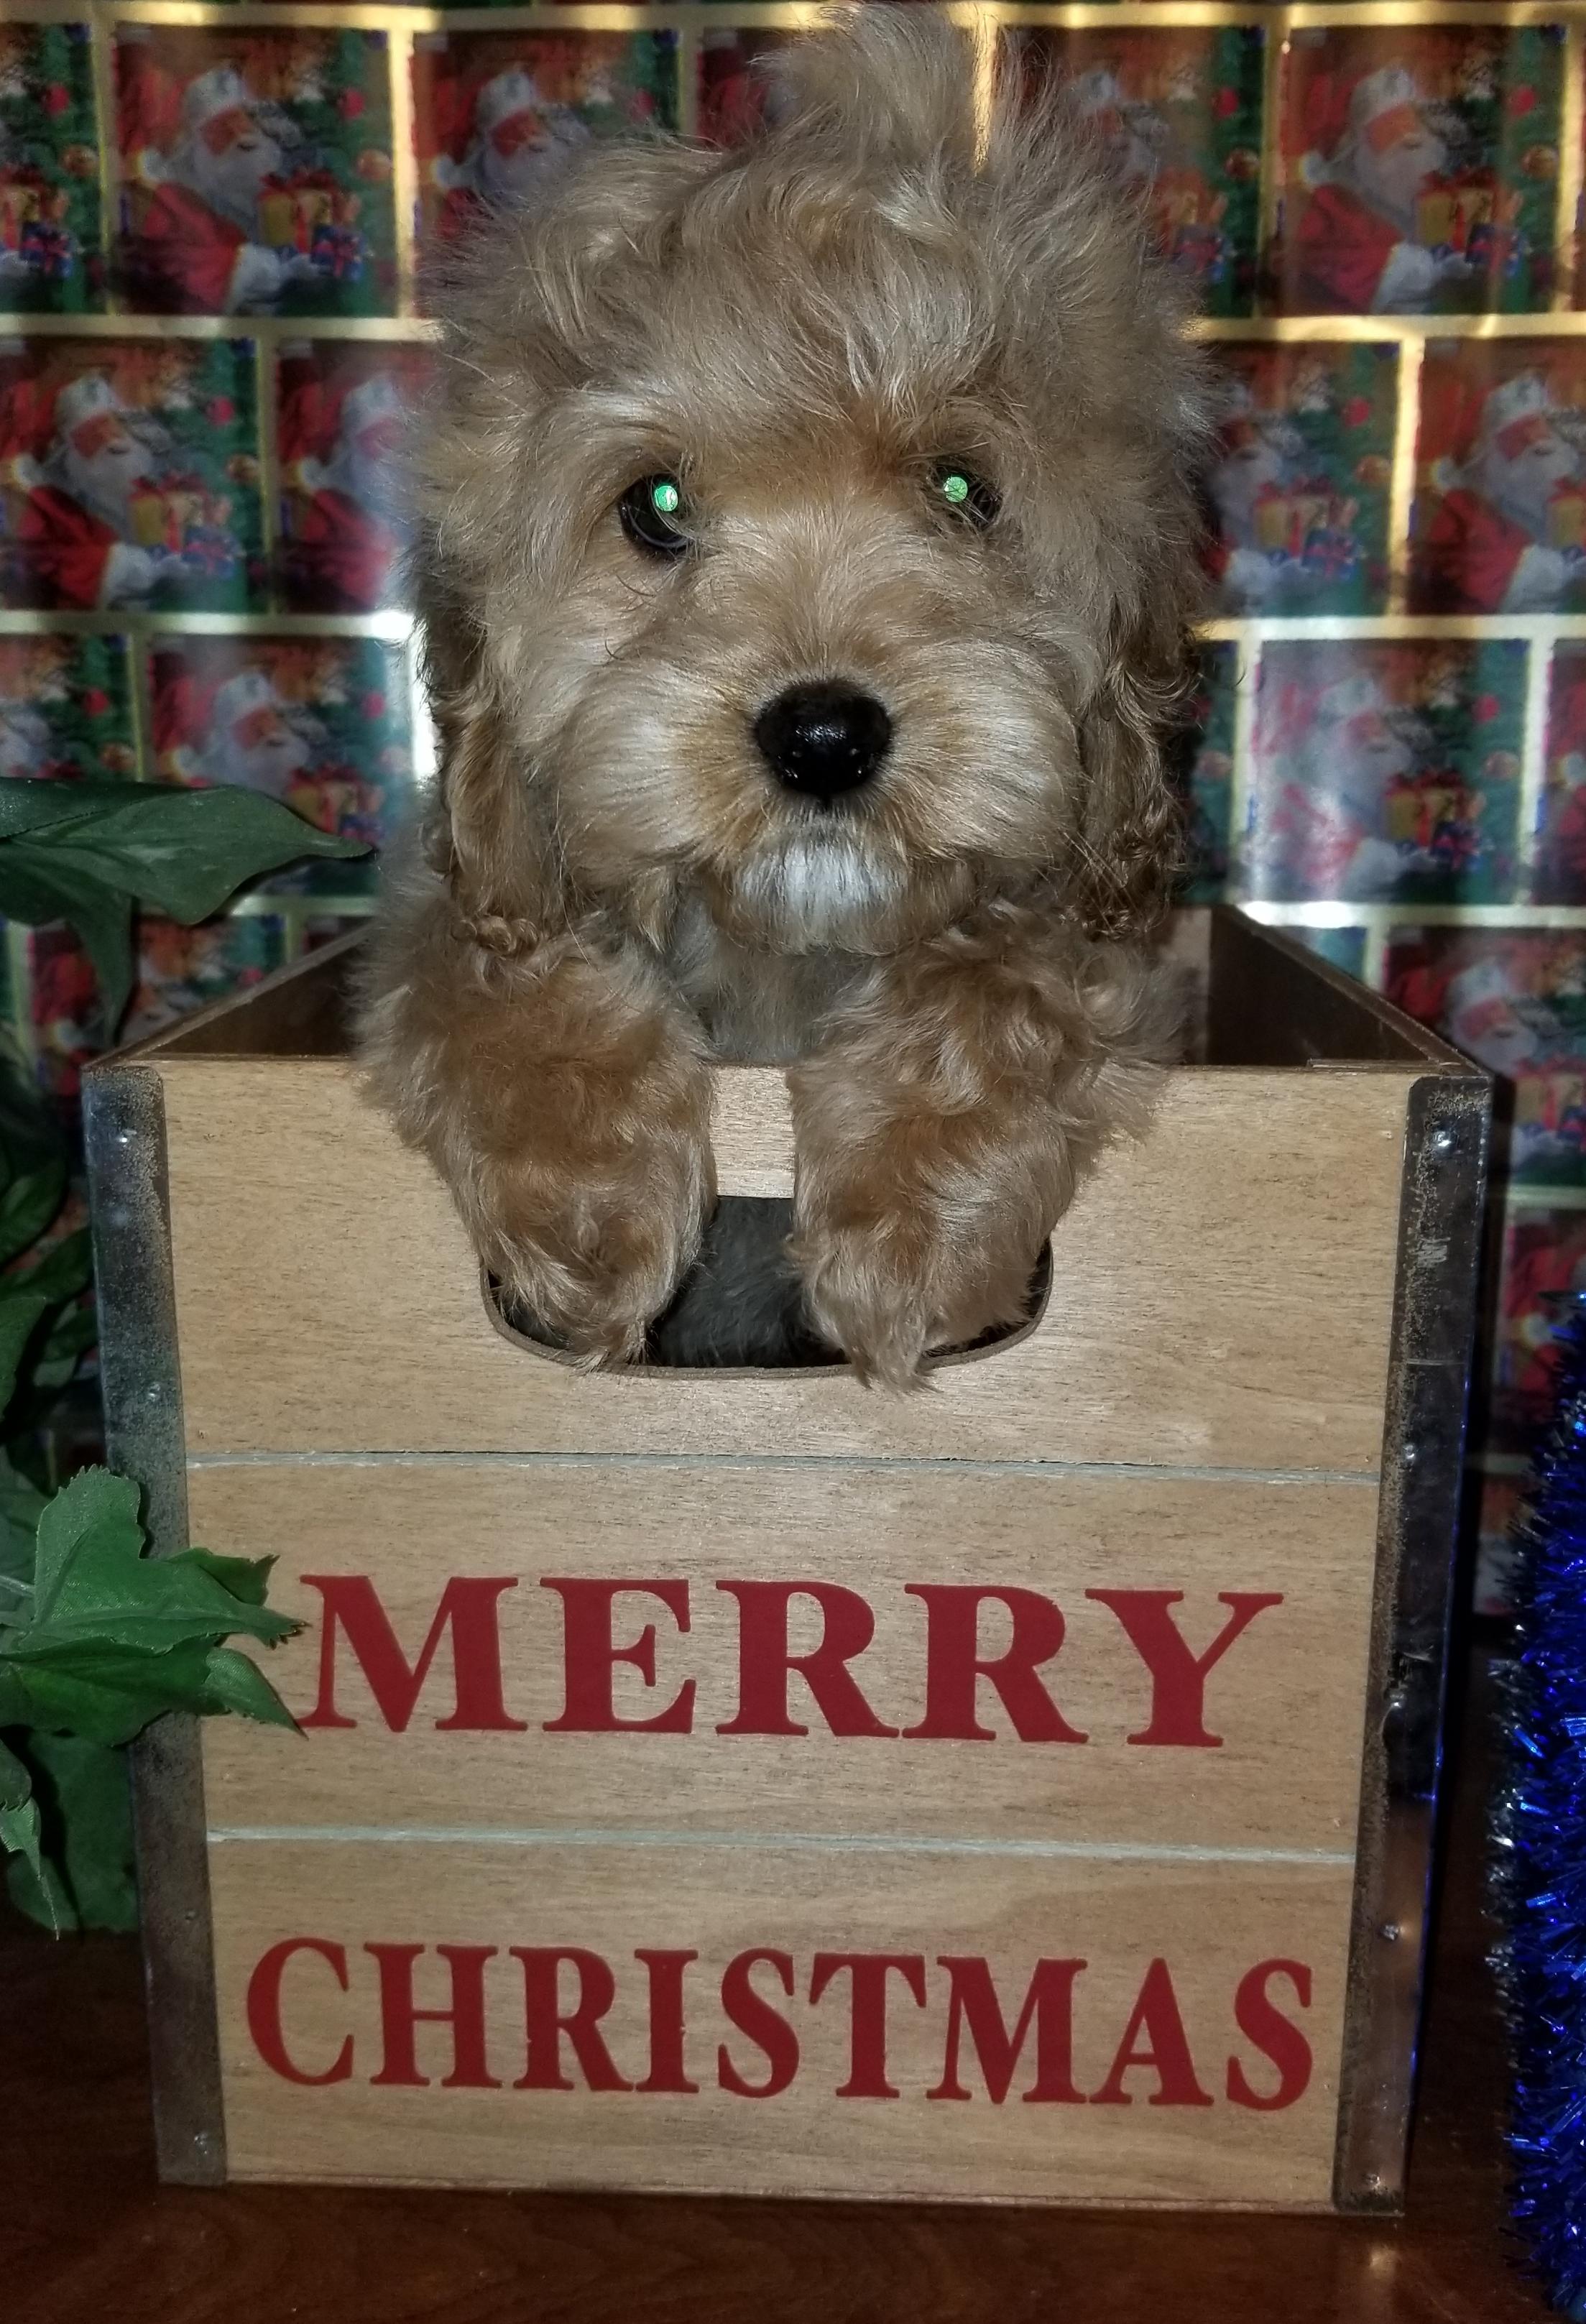 Sweet Family raised Cockapoo Puppies